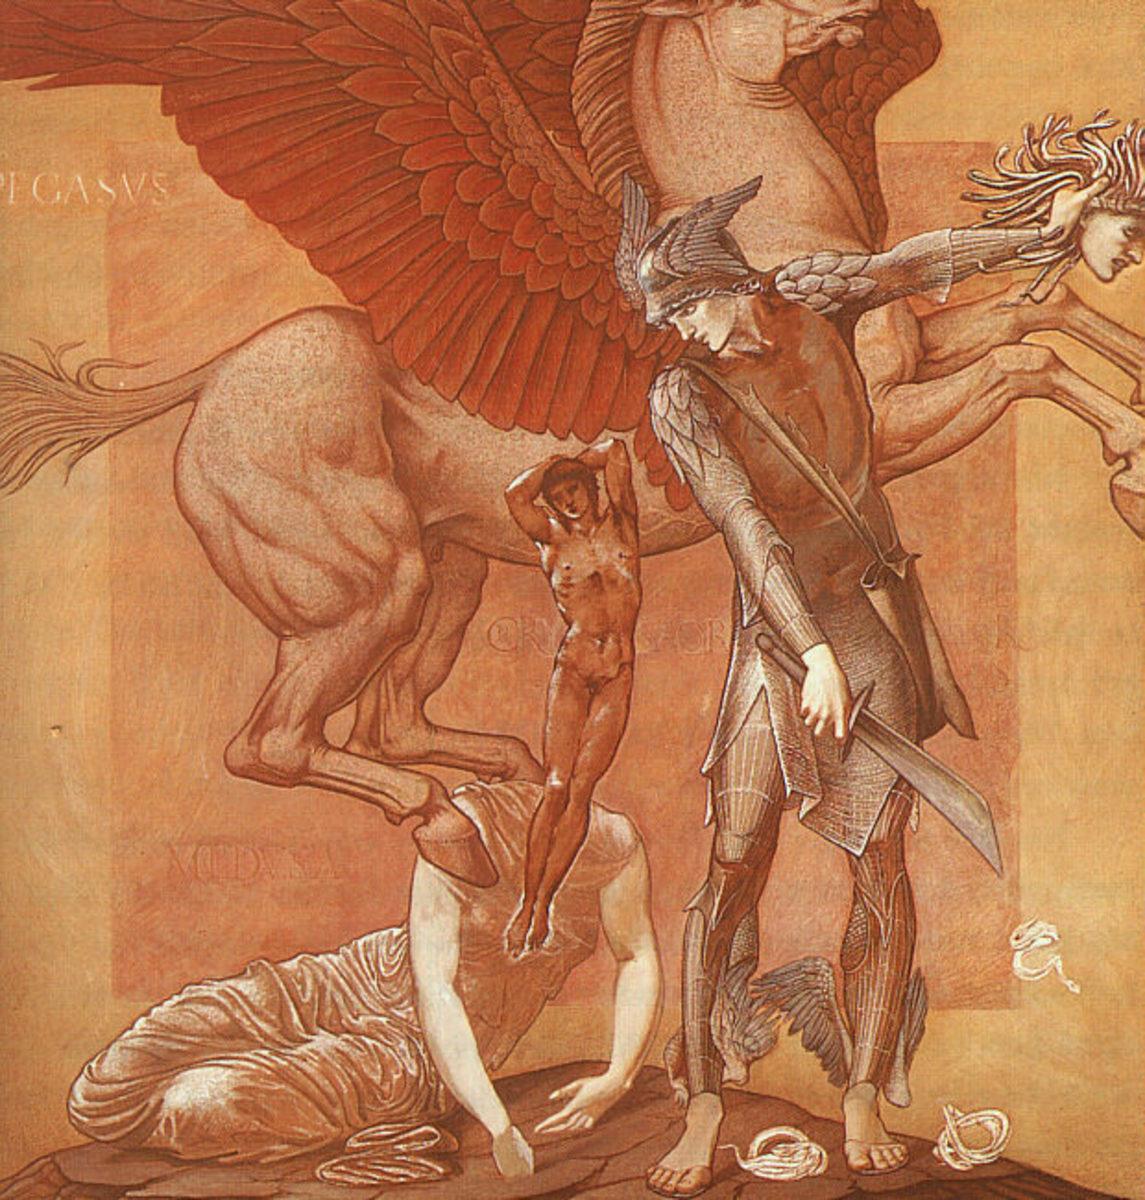 'The Birth of Pegasus and Chrysaor' by Edward Burne-Jones, C. 1876-1885.